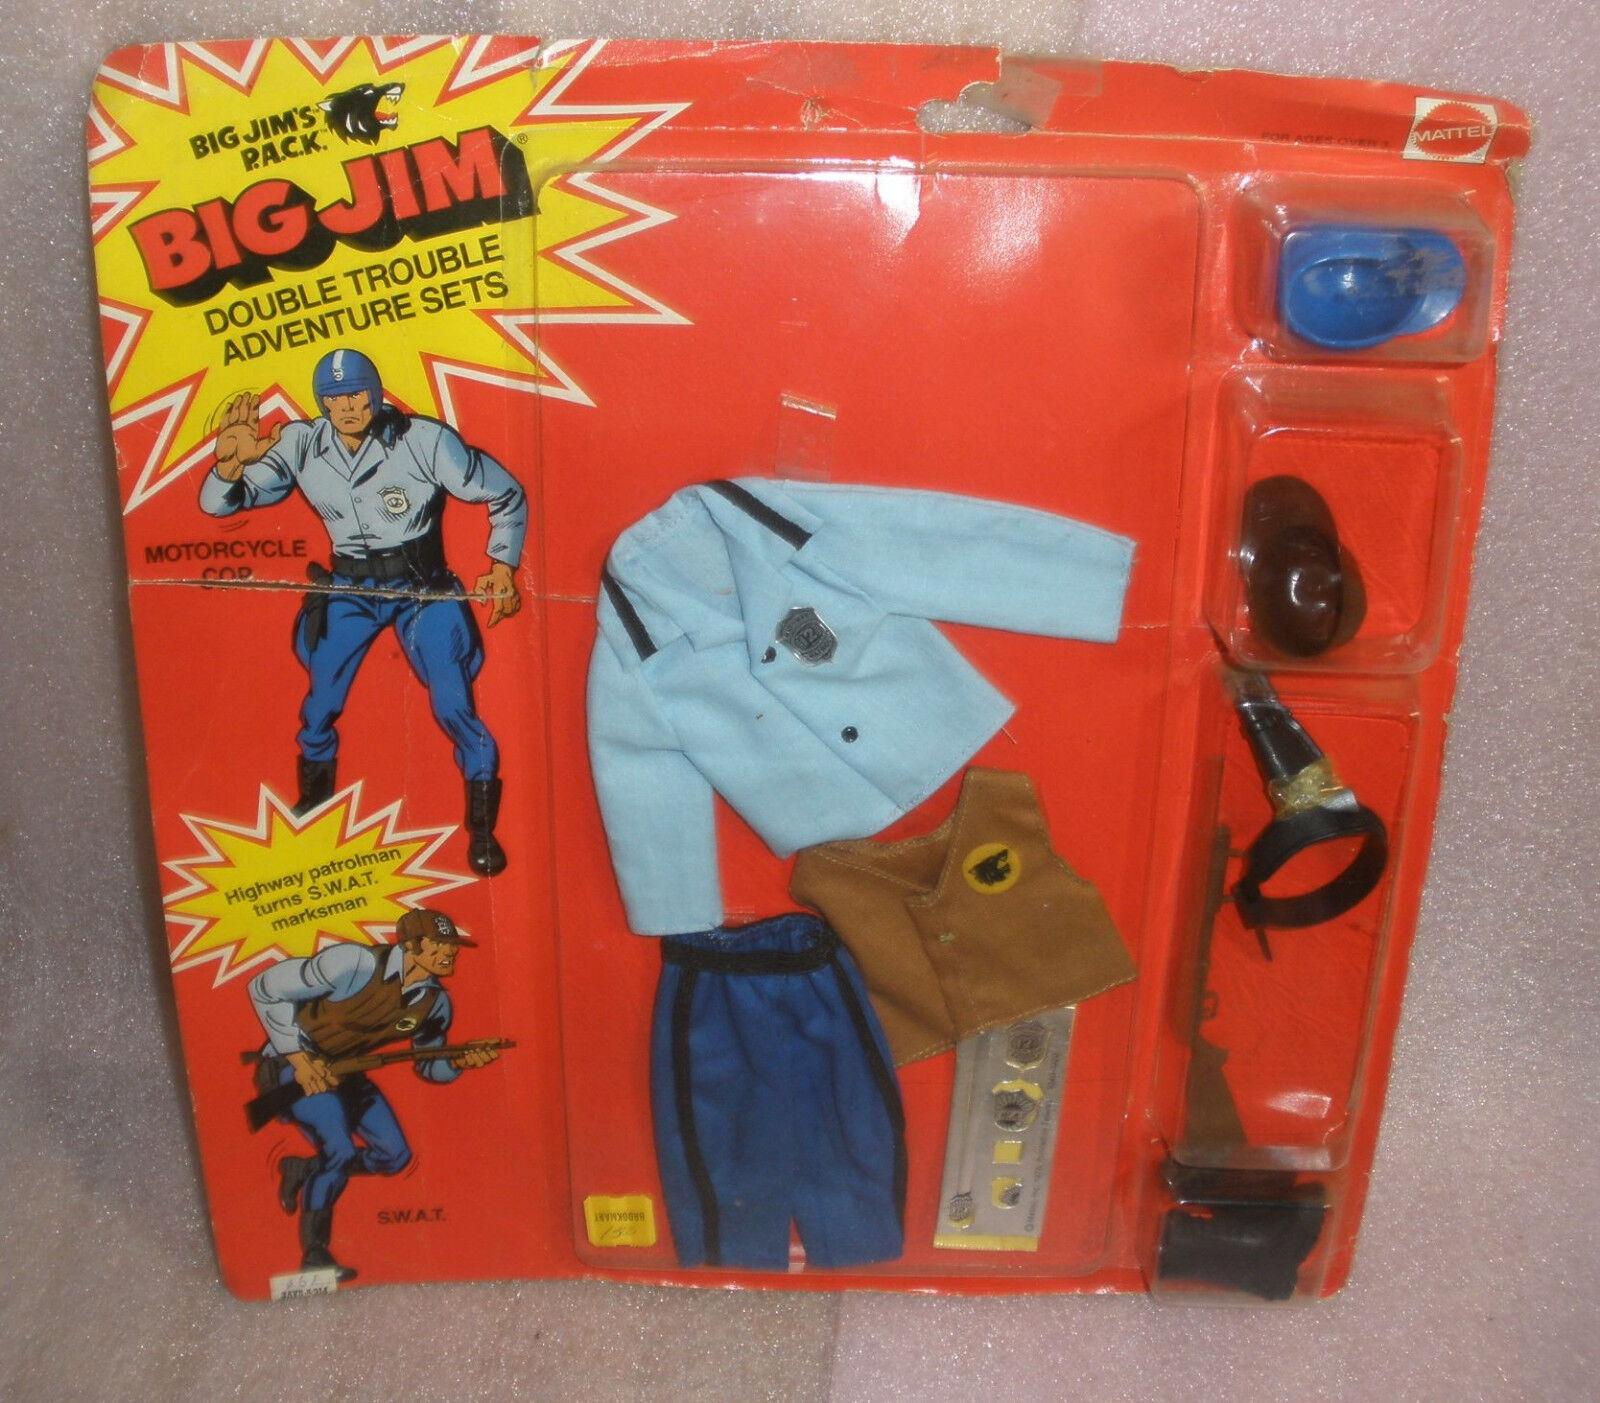 Big Jim Double Trouble Adventure Set Motorcycle cop Swat Mint on Card RARE